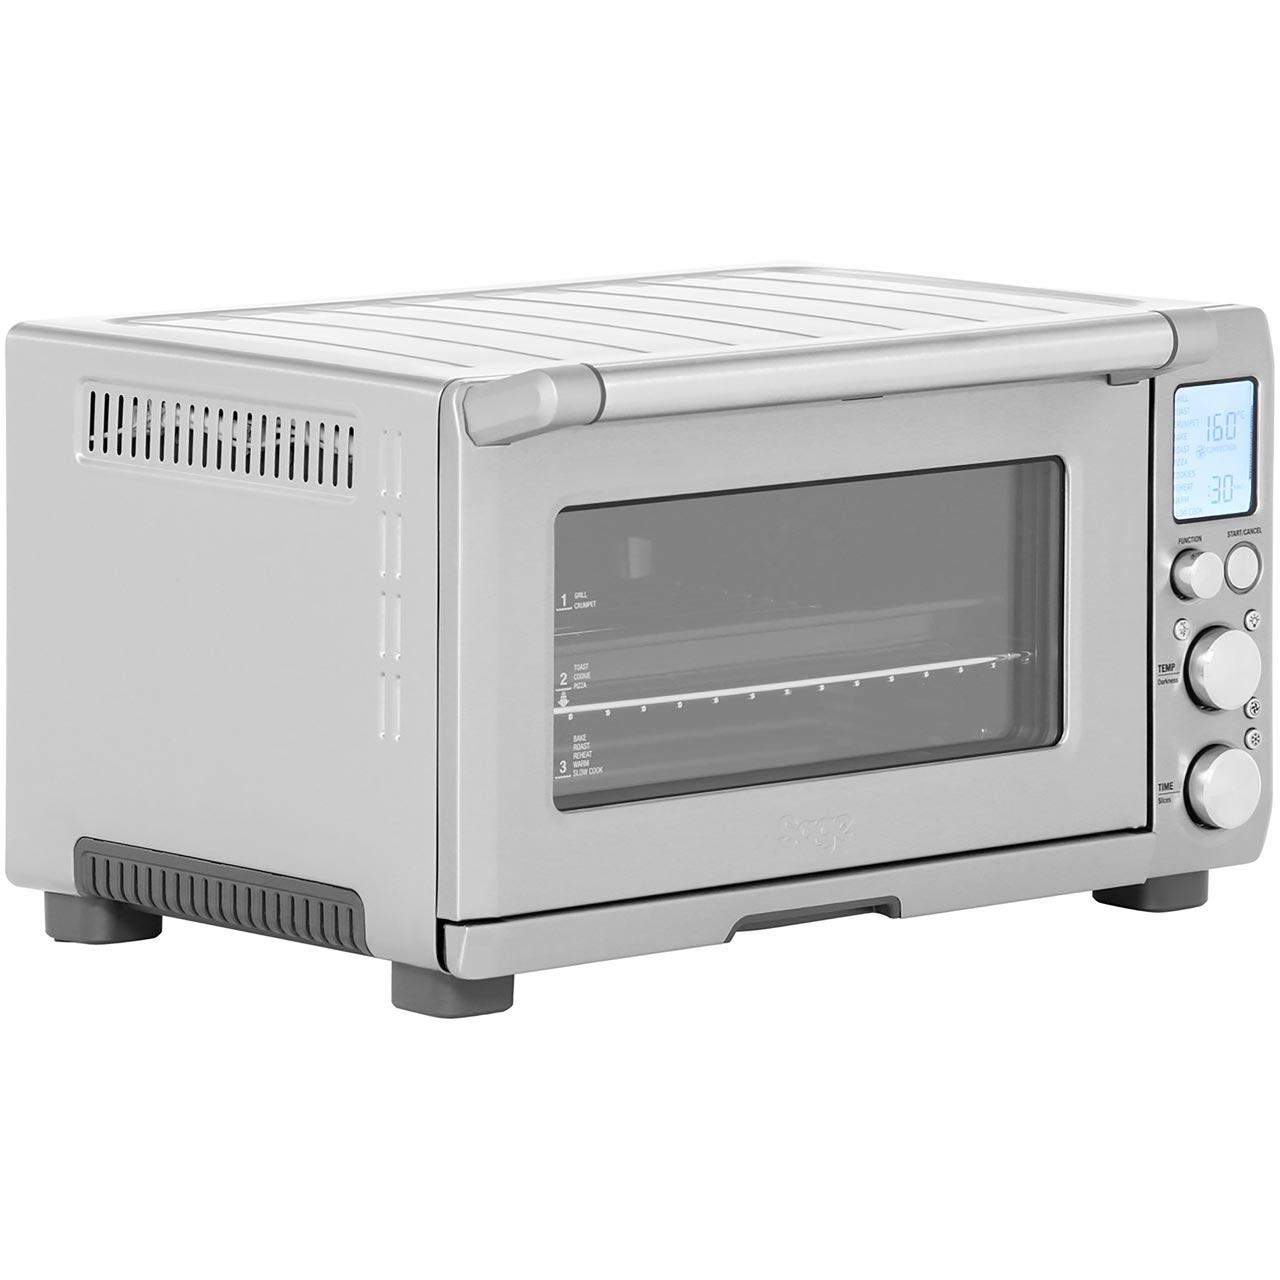 Sage Bov820bss The Smart Oven Pro Mini Ovens Amp Hob Free